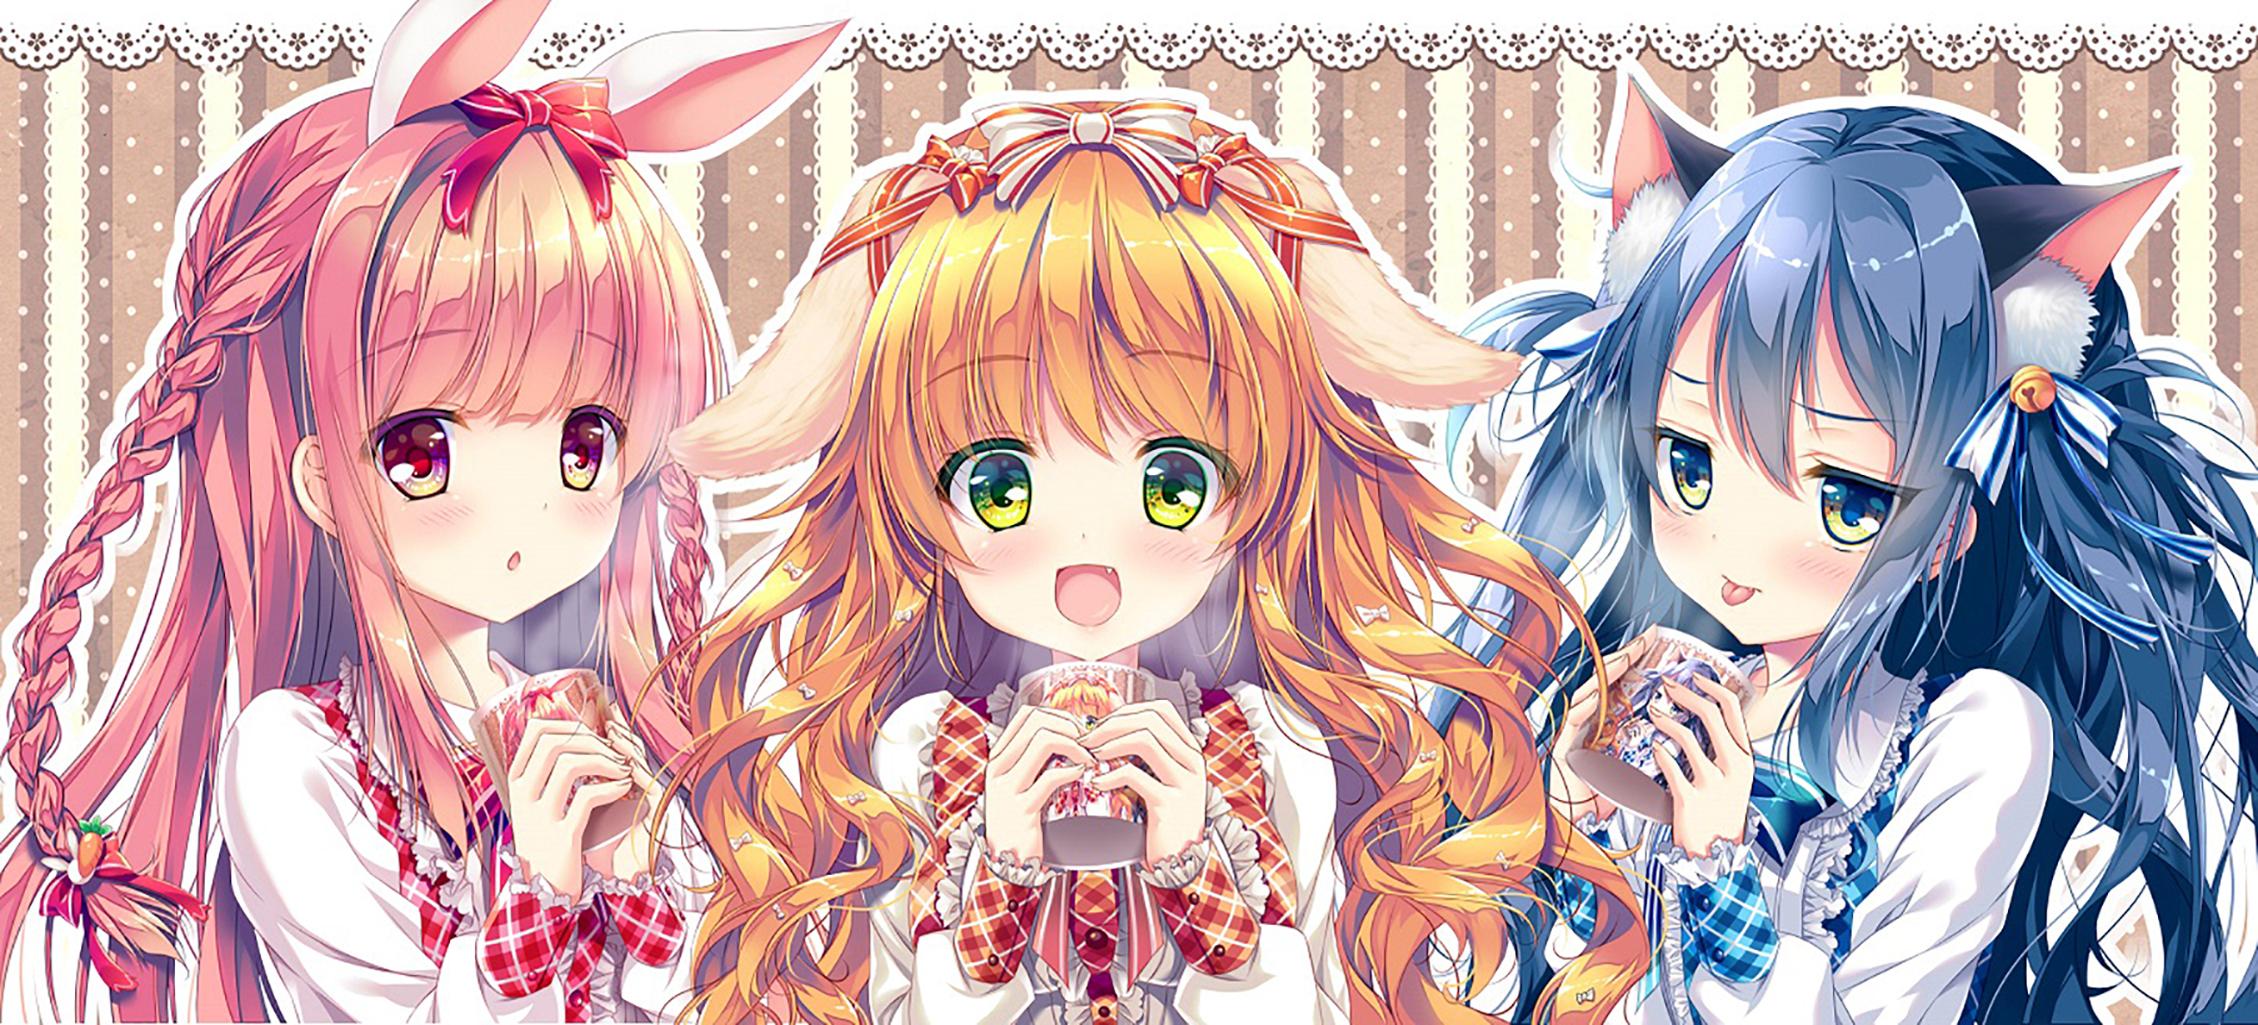 Pink Hair Orange Hair Blue Hair Long Hair Ribbon Red Eyes Green Eyes Blue Eyes Dress 2258x1025